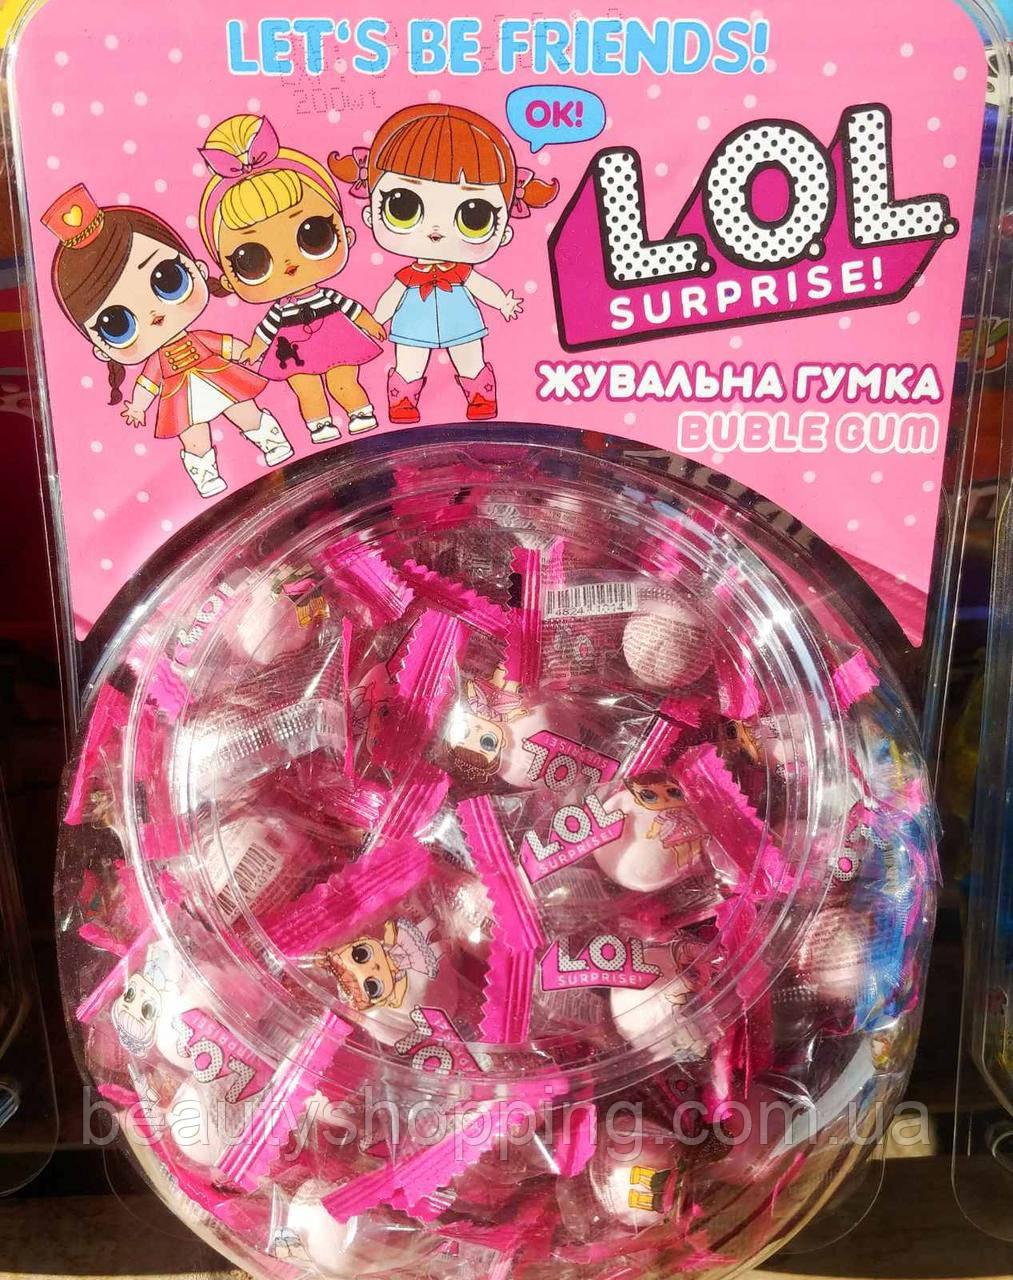 Lol Surprise Bubble Gum лол жувальні гумки з фруктовим смаком 200 шт Туреччина